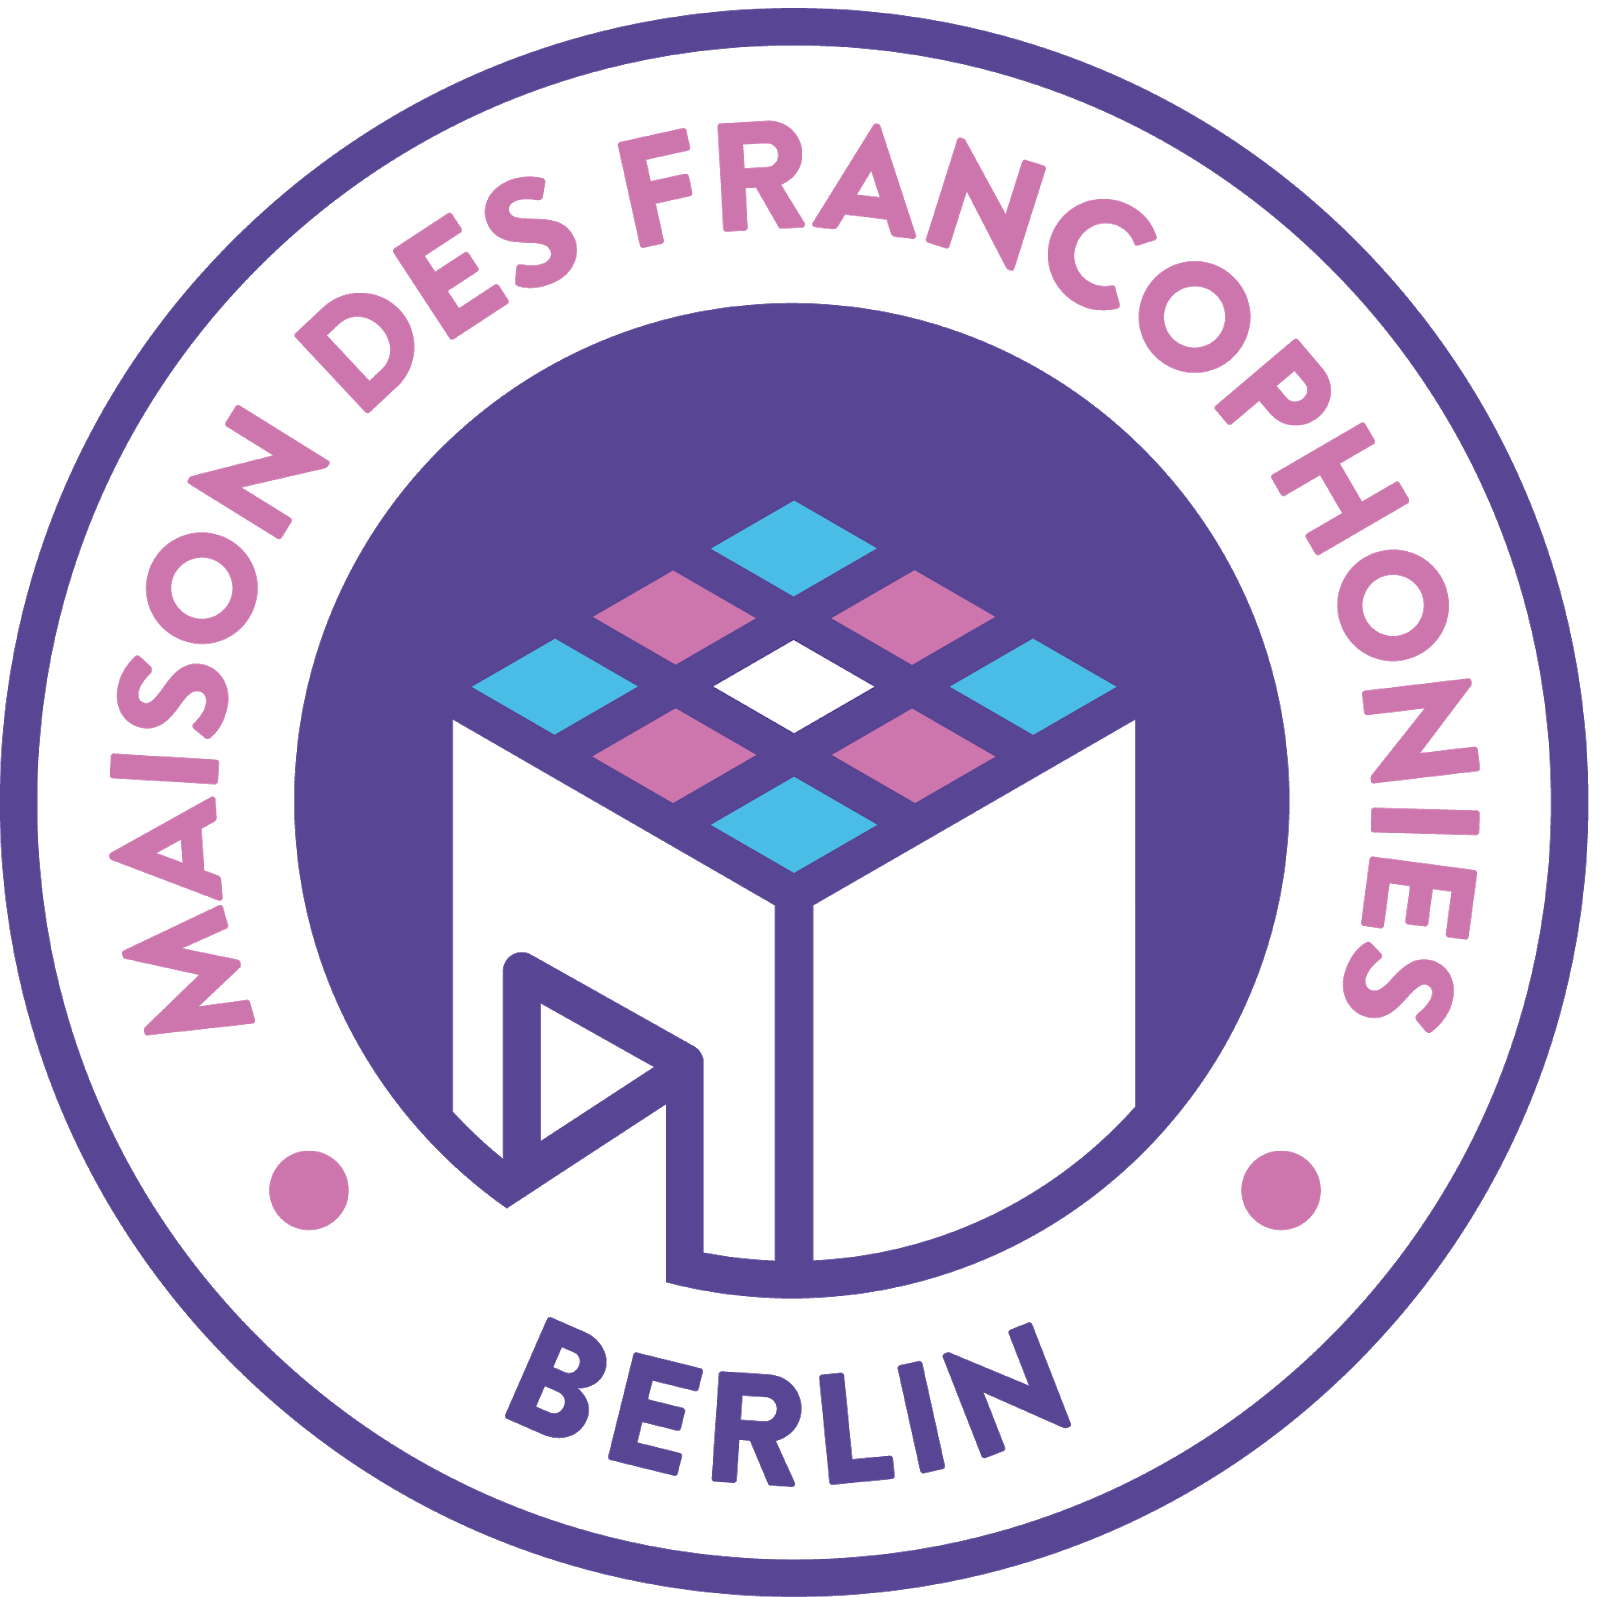 maison des francos logo